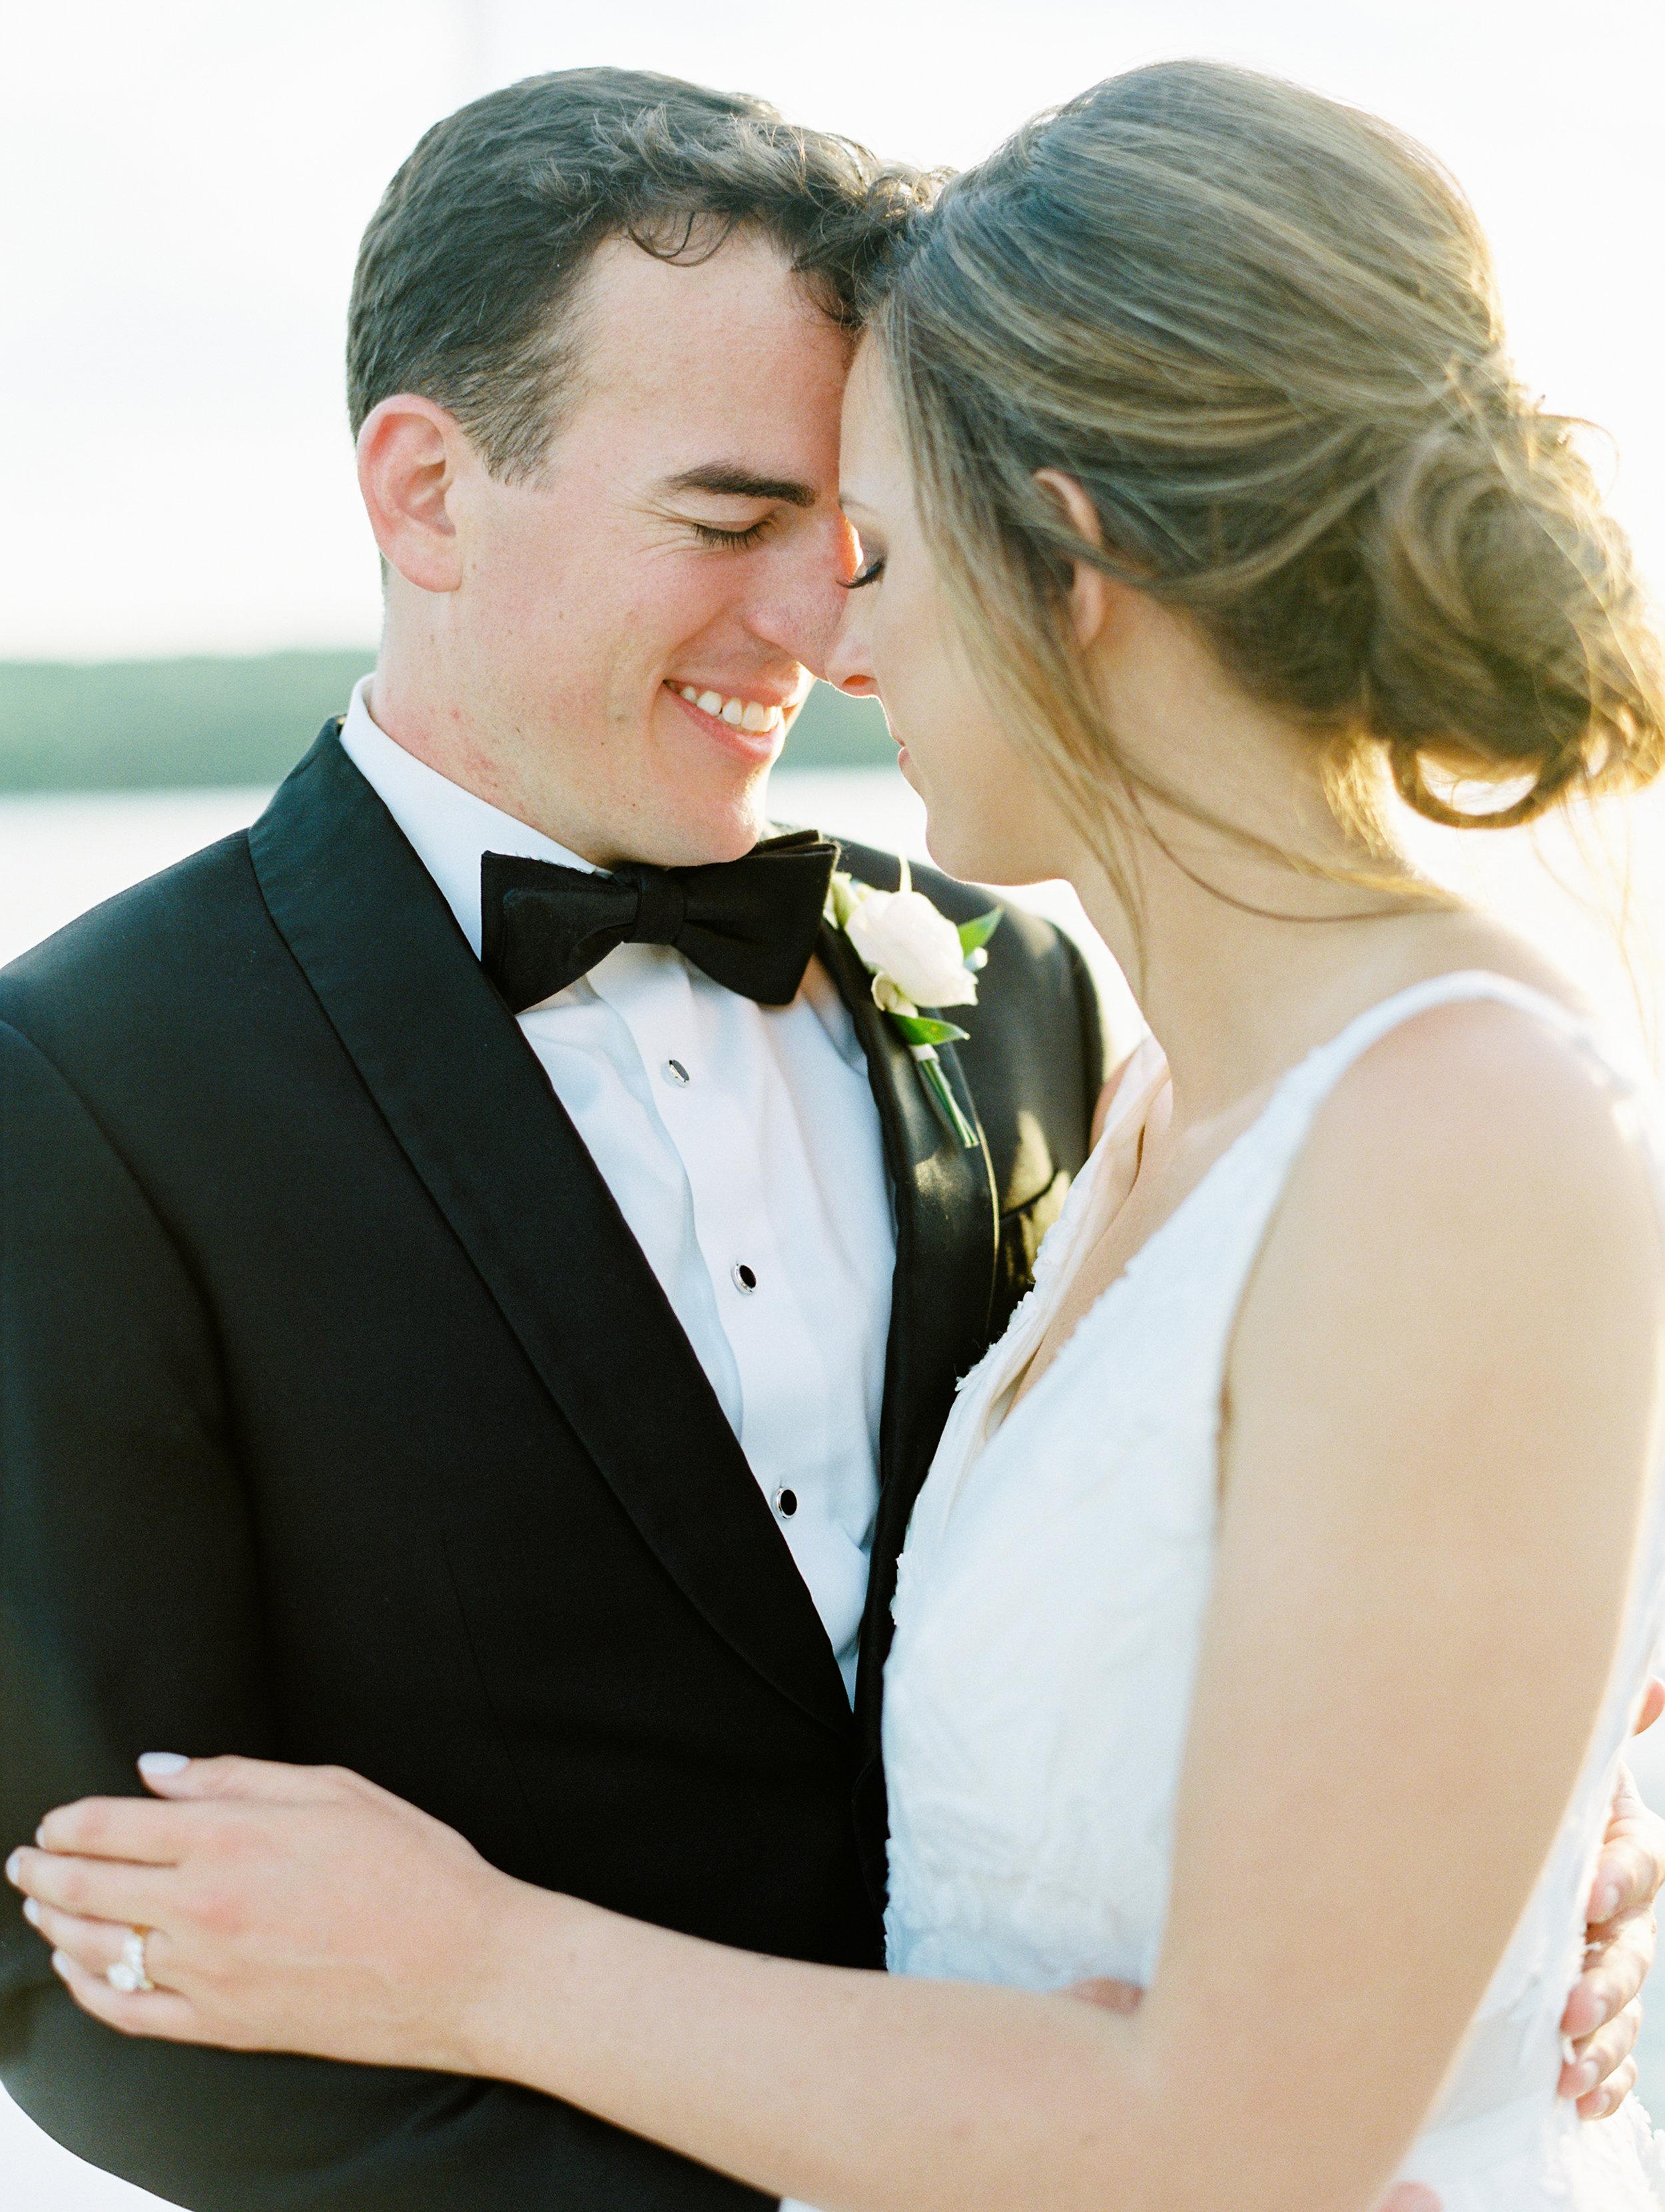 DeGuilio+Wedding+BrideGroomSunsetf-2.jpg